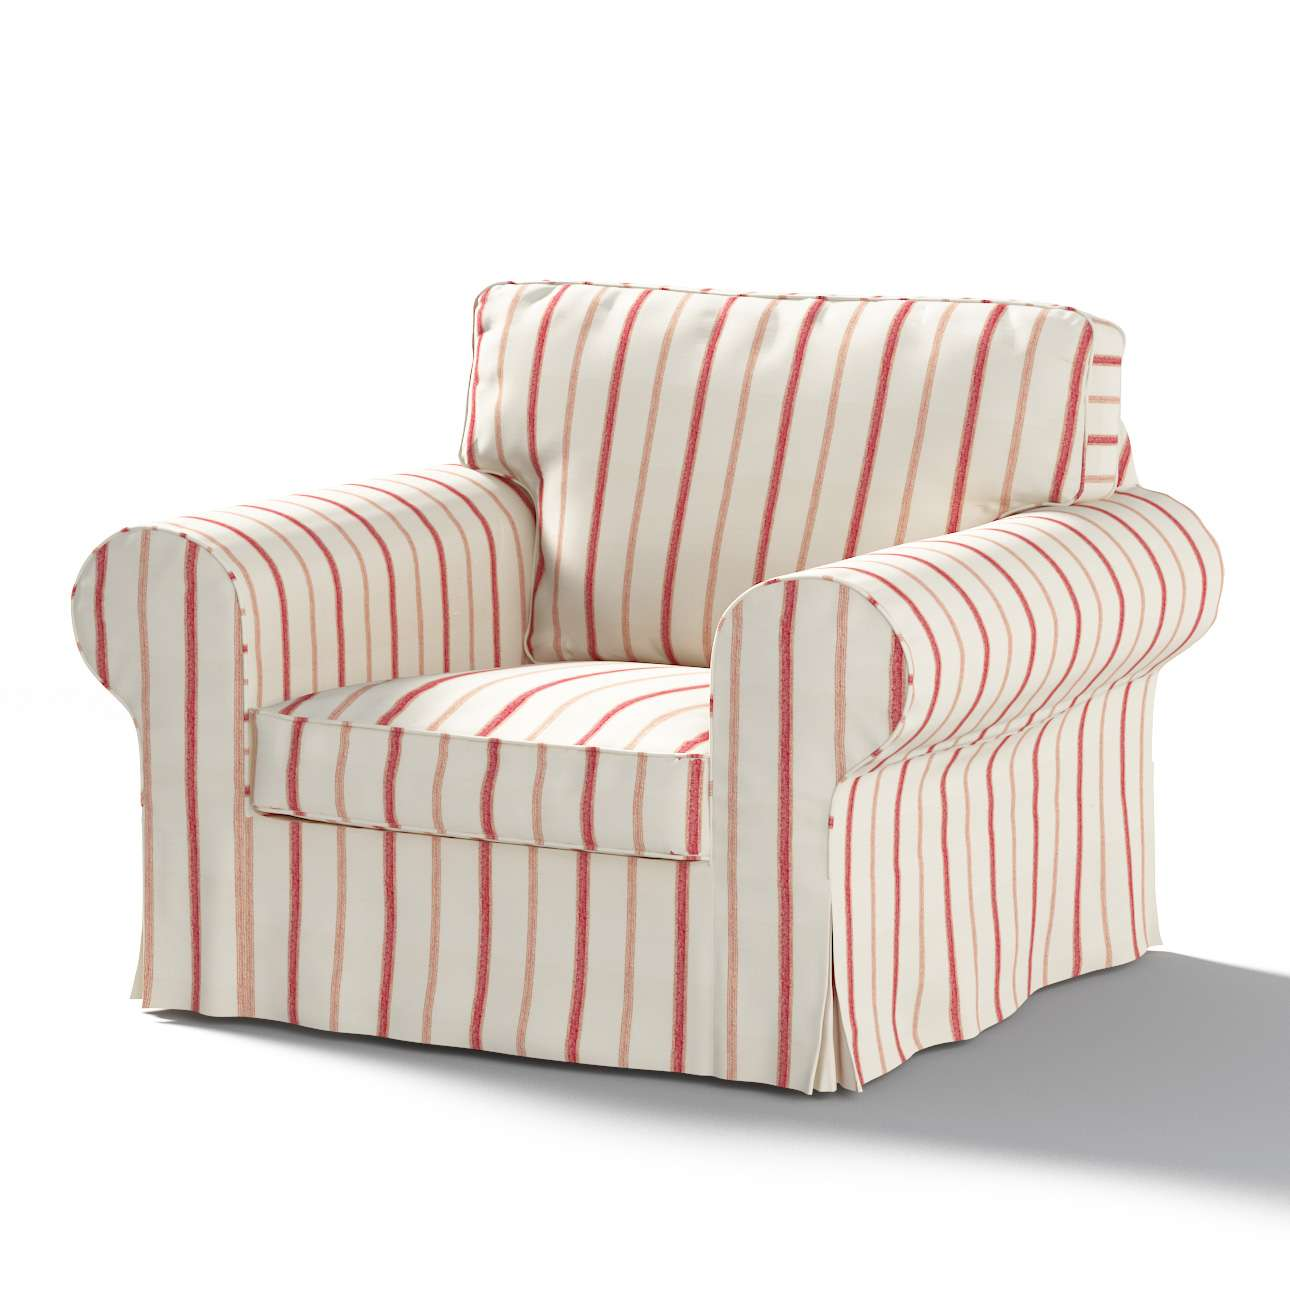 Ektorp Sesselbezug von der Kollektion Avinon, Stoff: 129-15